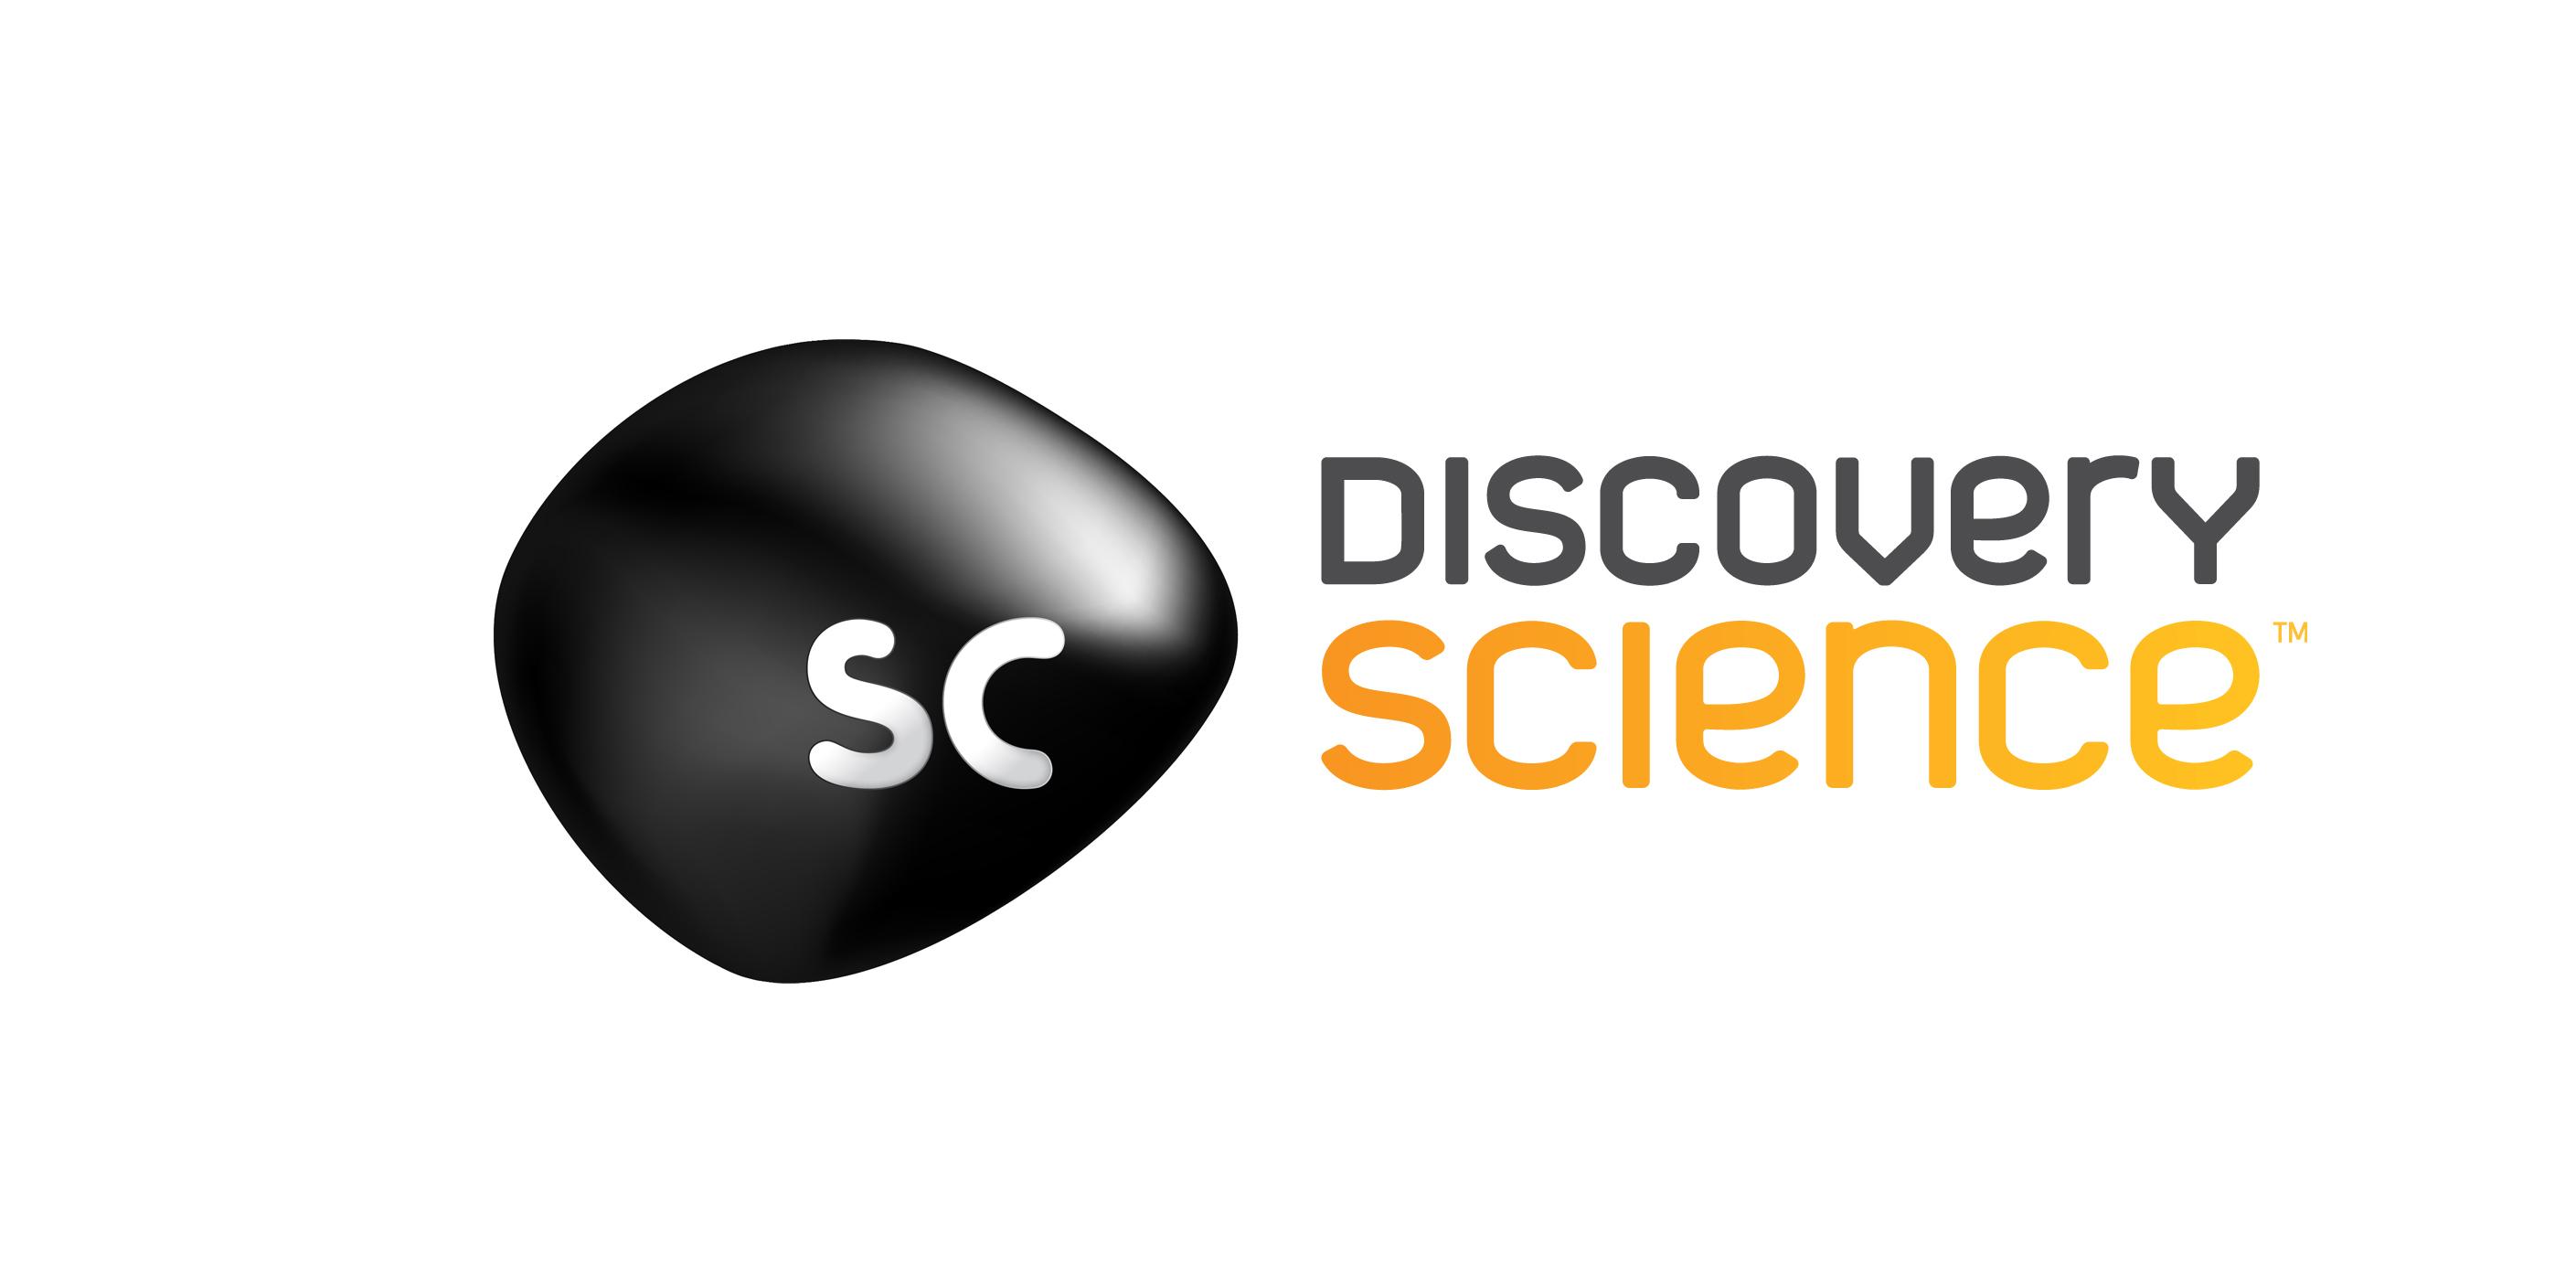 Совершайте открытия с yes и Discovery Science